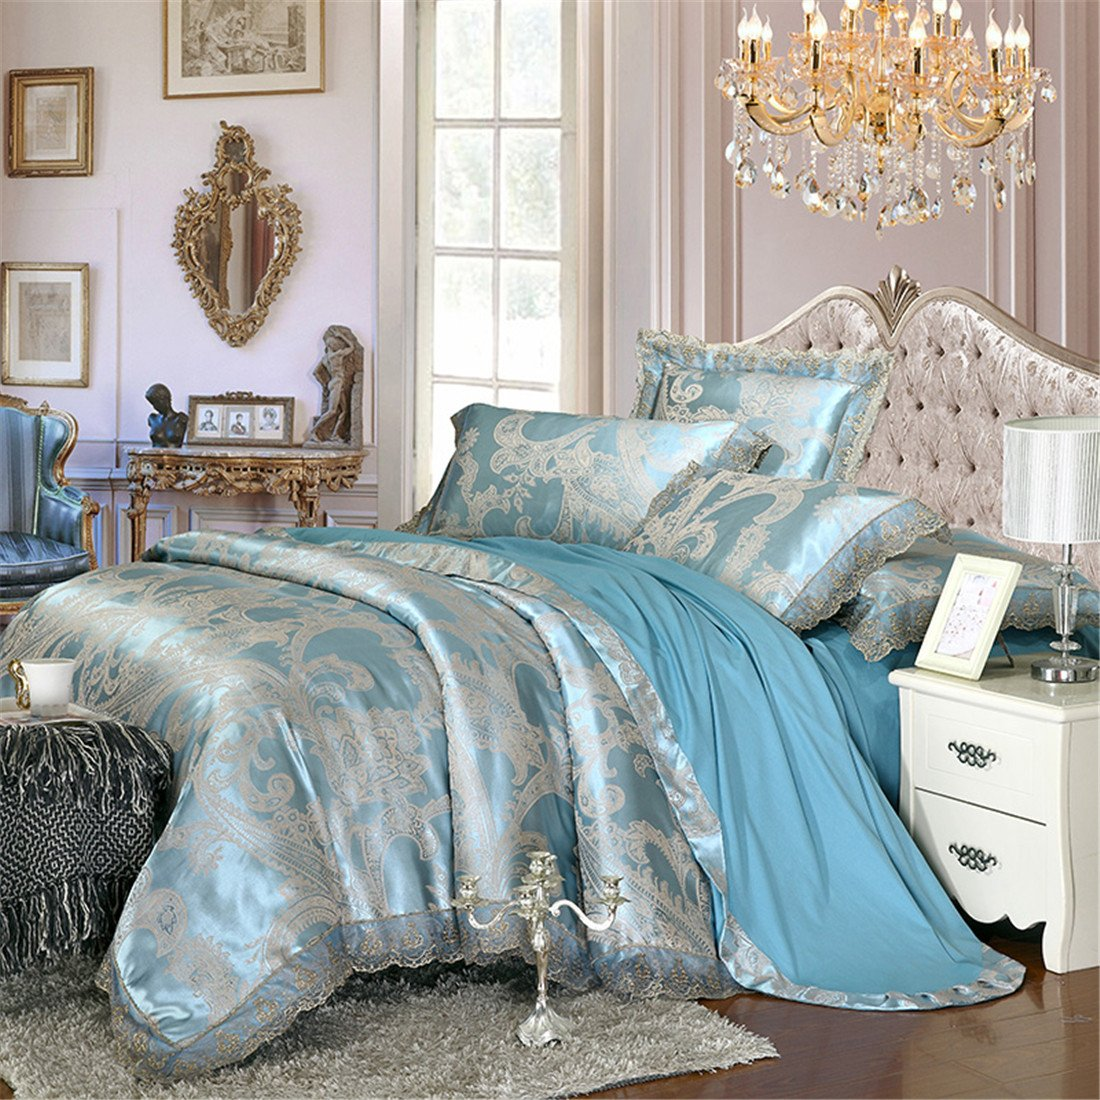 Lace Bedding Amazon Com